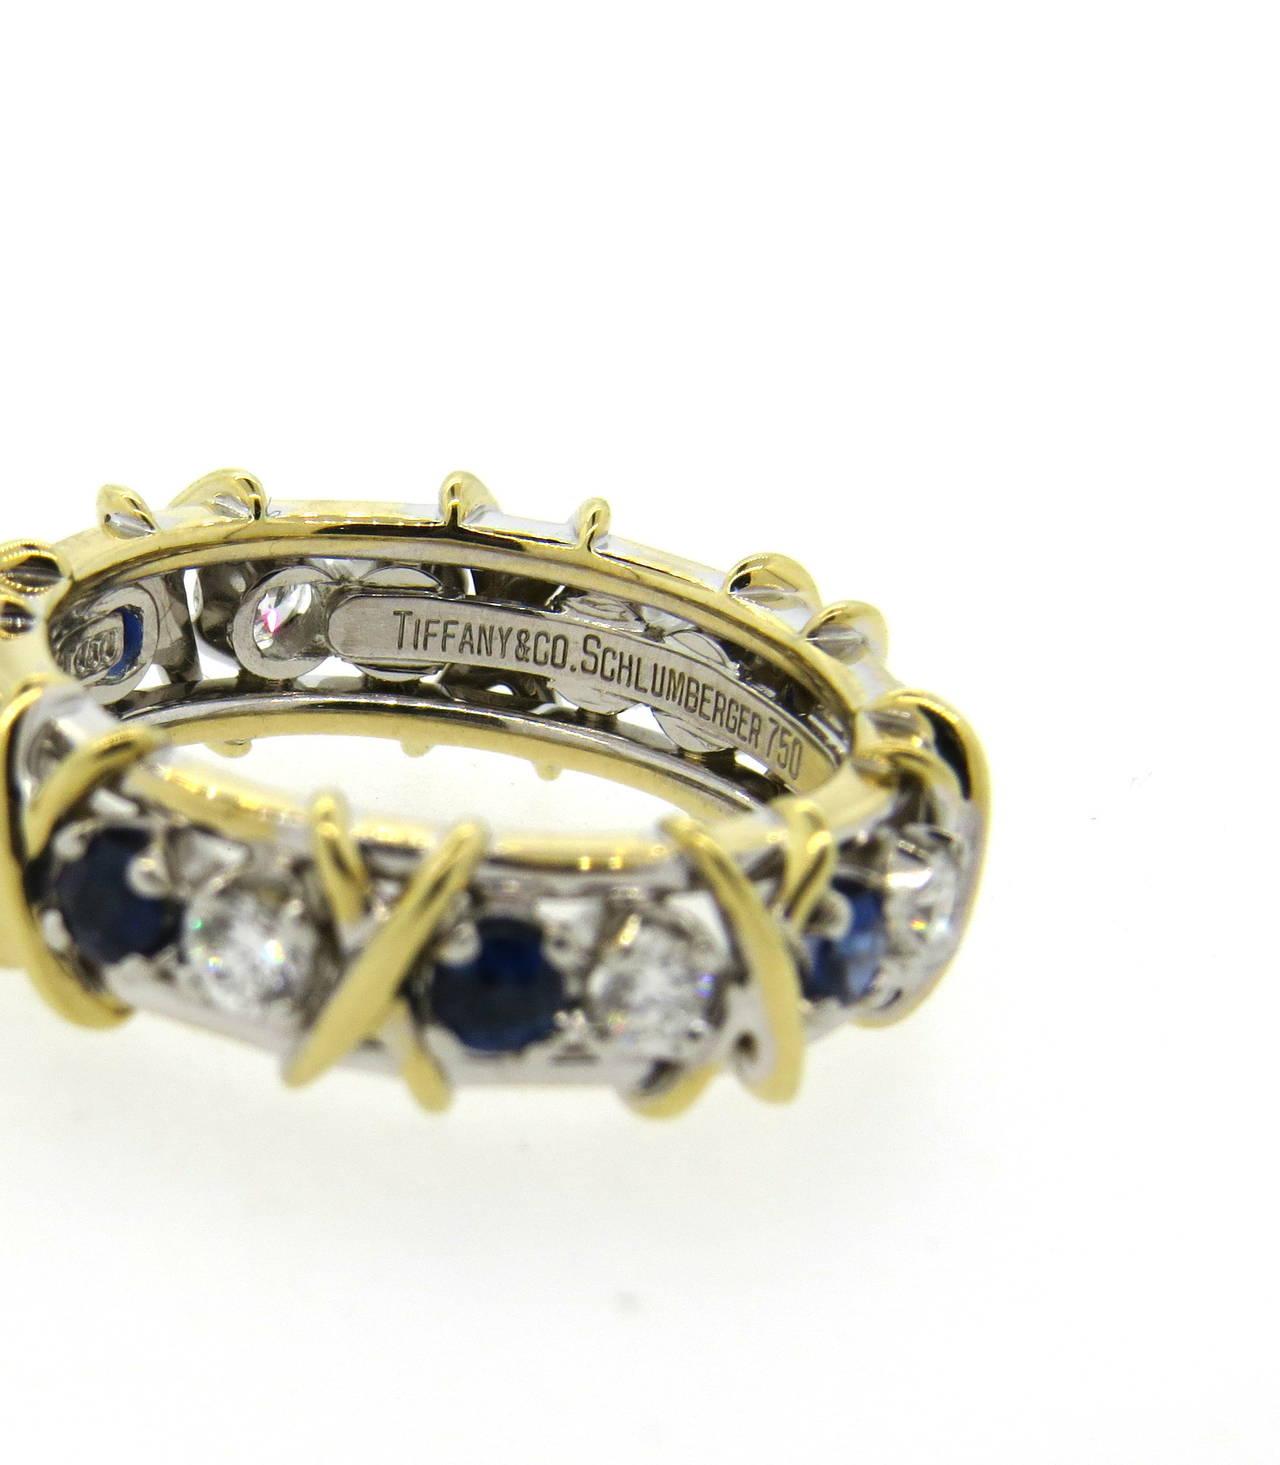 Tiffany Co Sapphire Rings